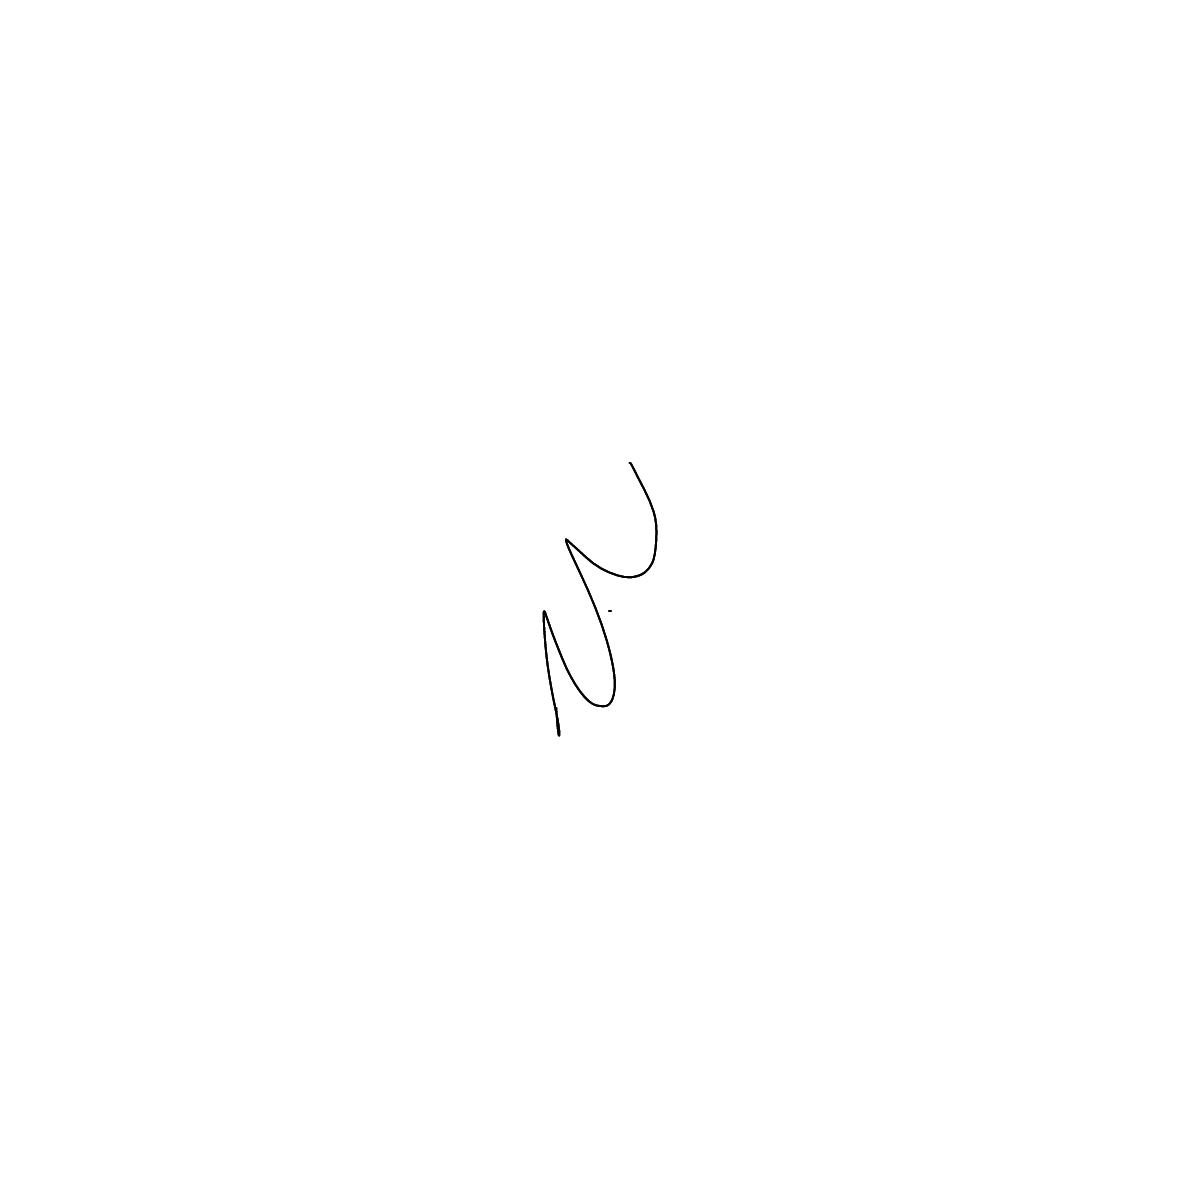 BAAAM drawing#586 lat:60.3920021057128900lng: 5.3308801651000980